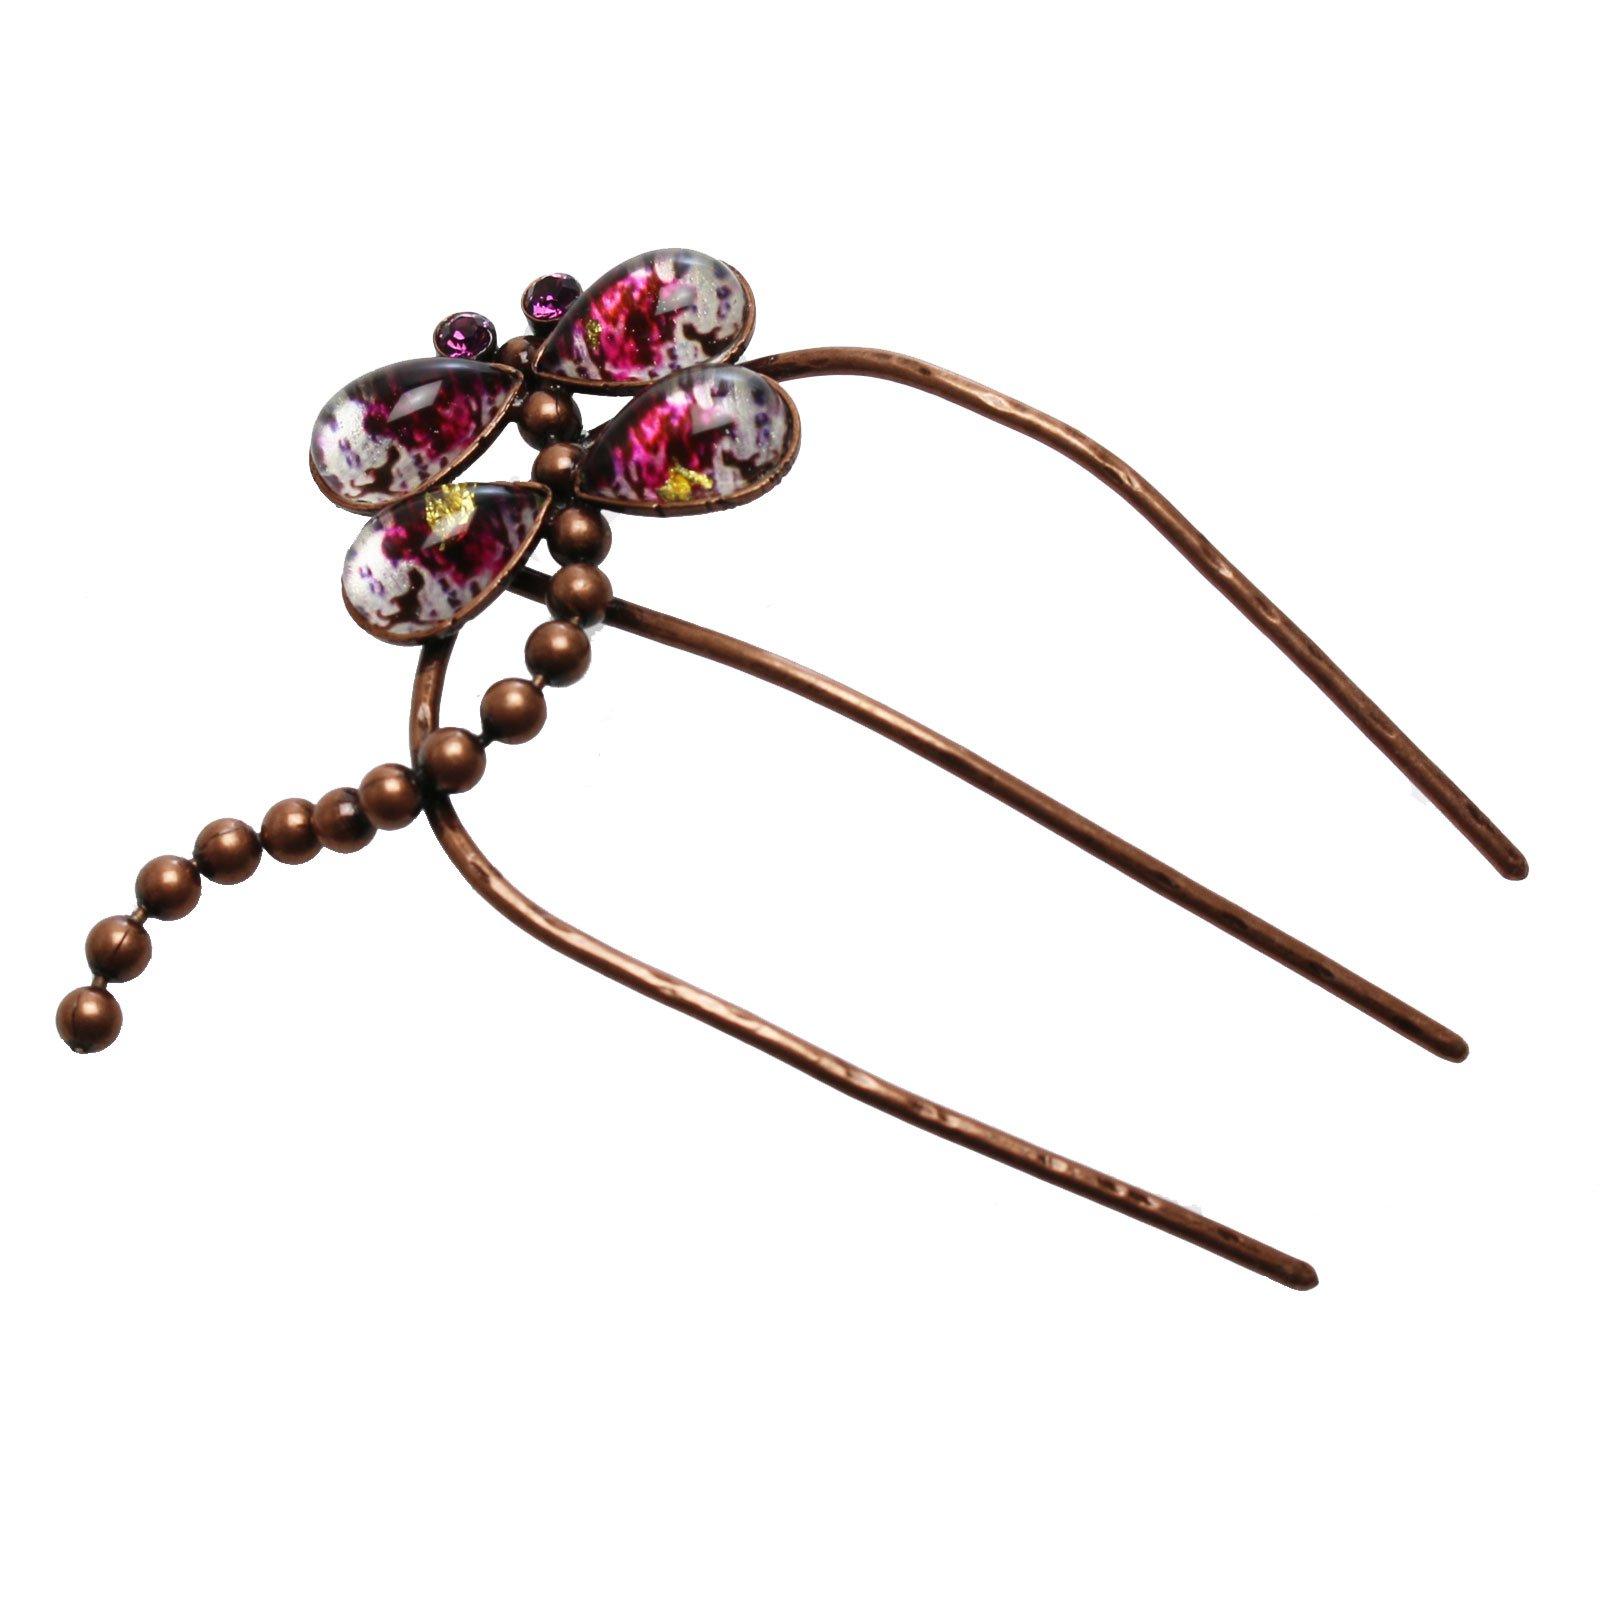 Tamarusan Hair Comb Dinosaur Dragonfly Hair Ornament Handmade Purple